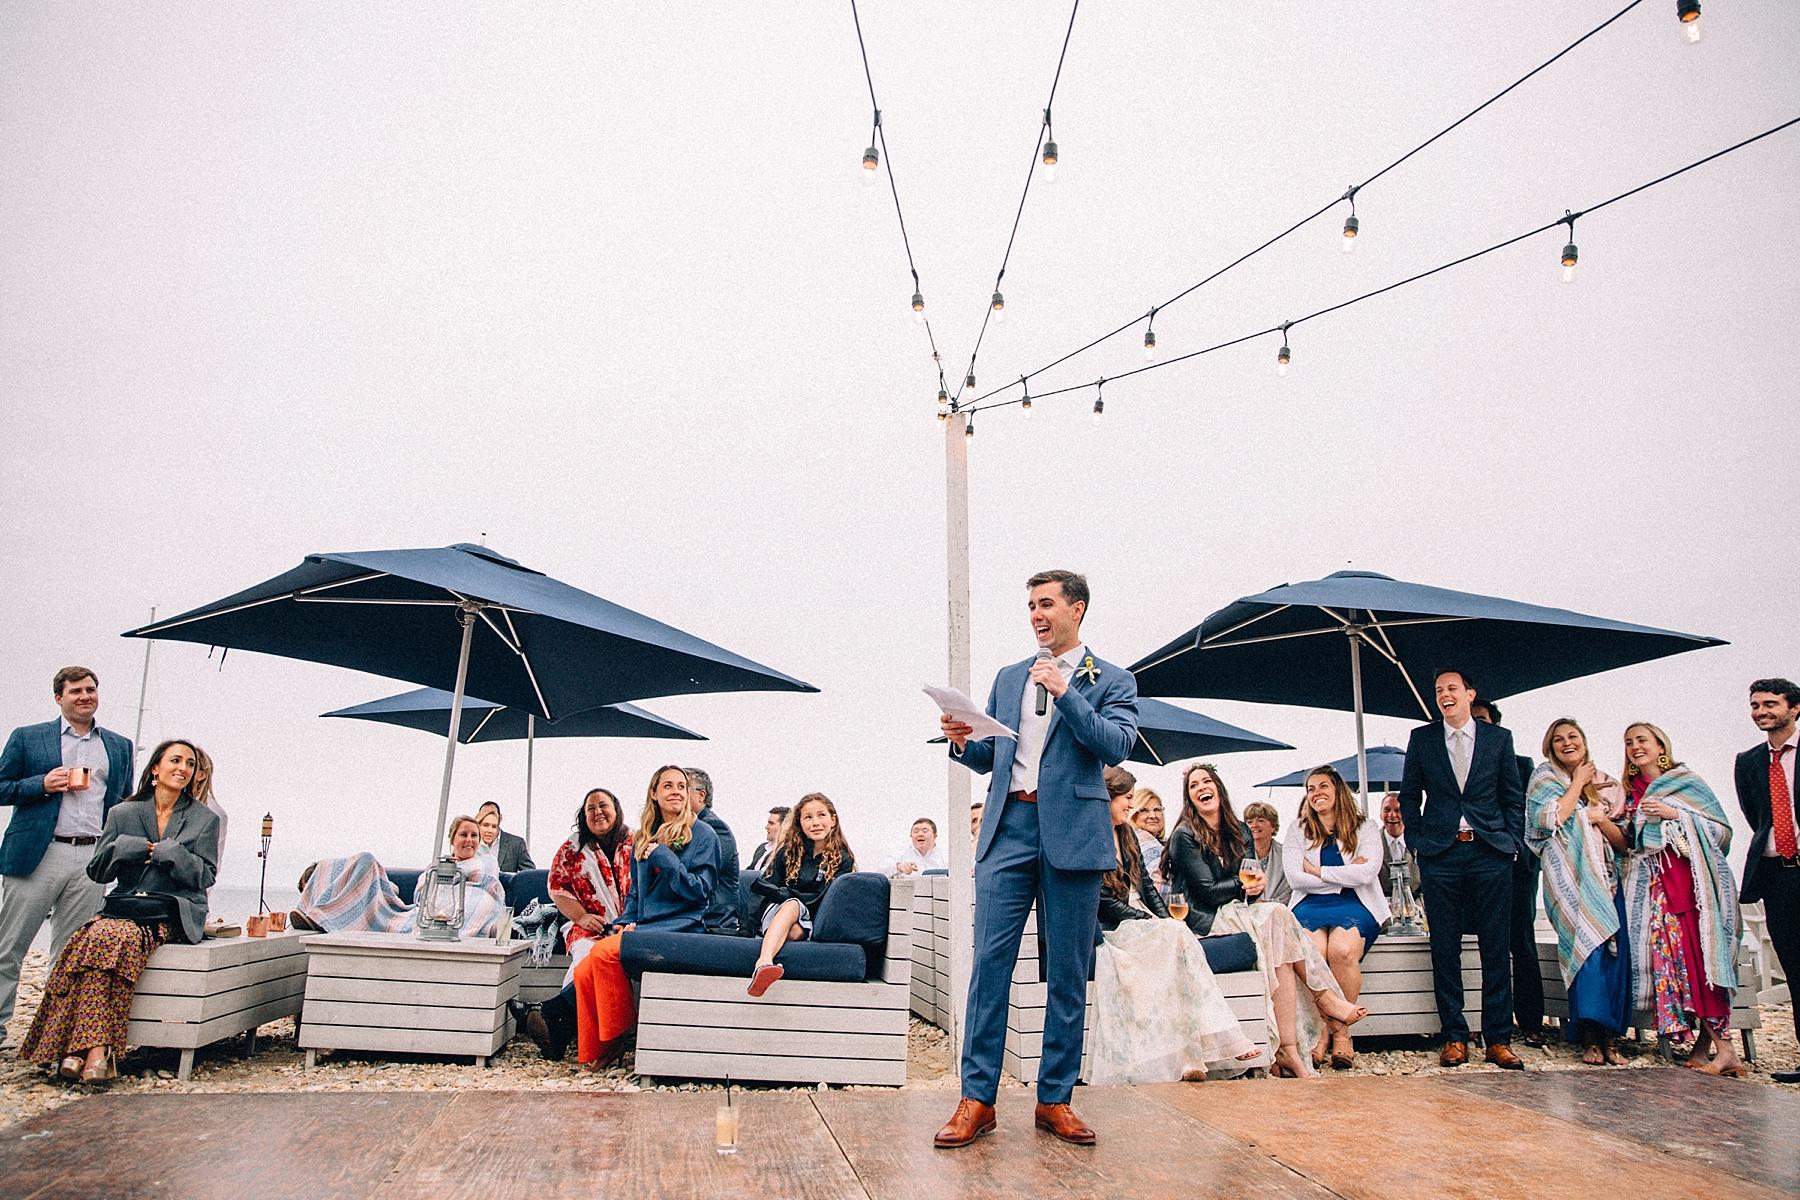 montauk-wedding-photography-rainy-navy-beach_0054.jpg